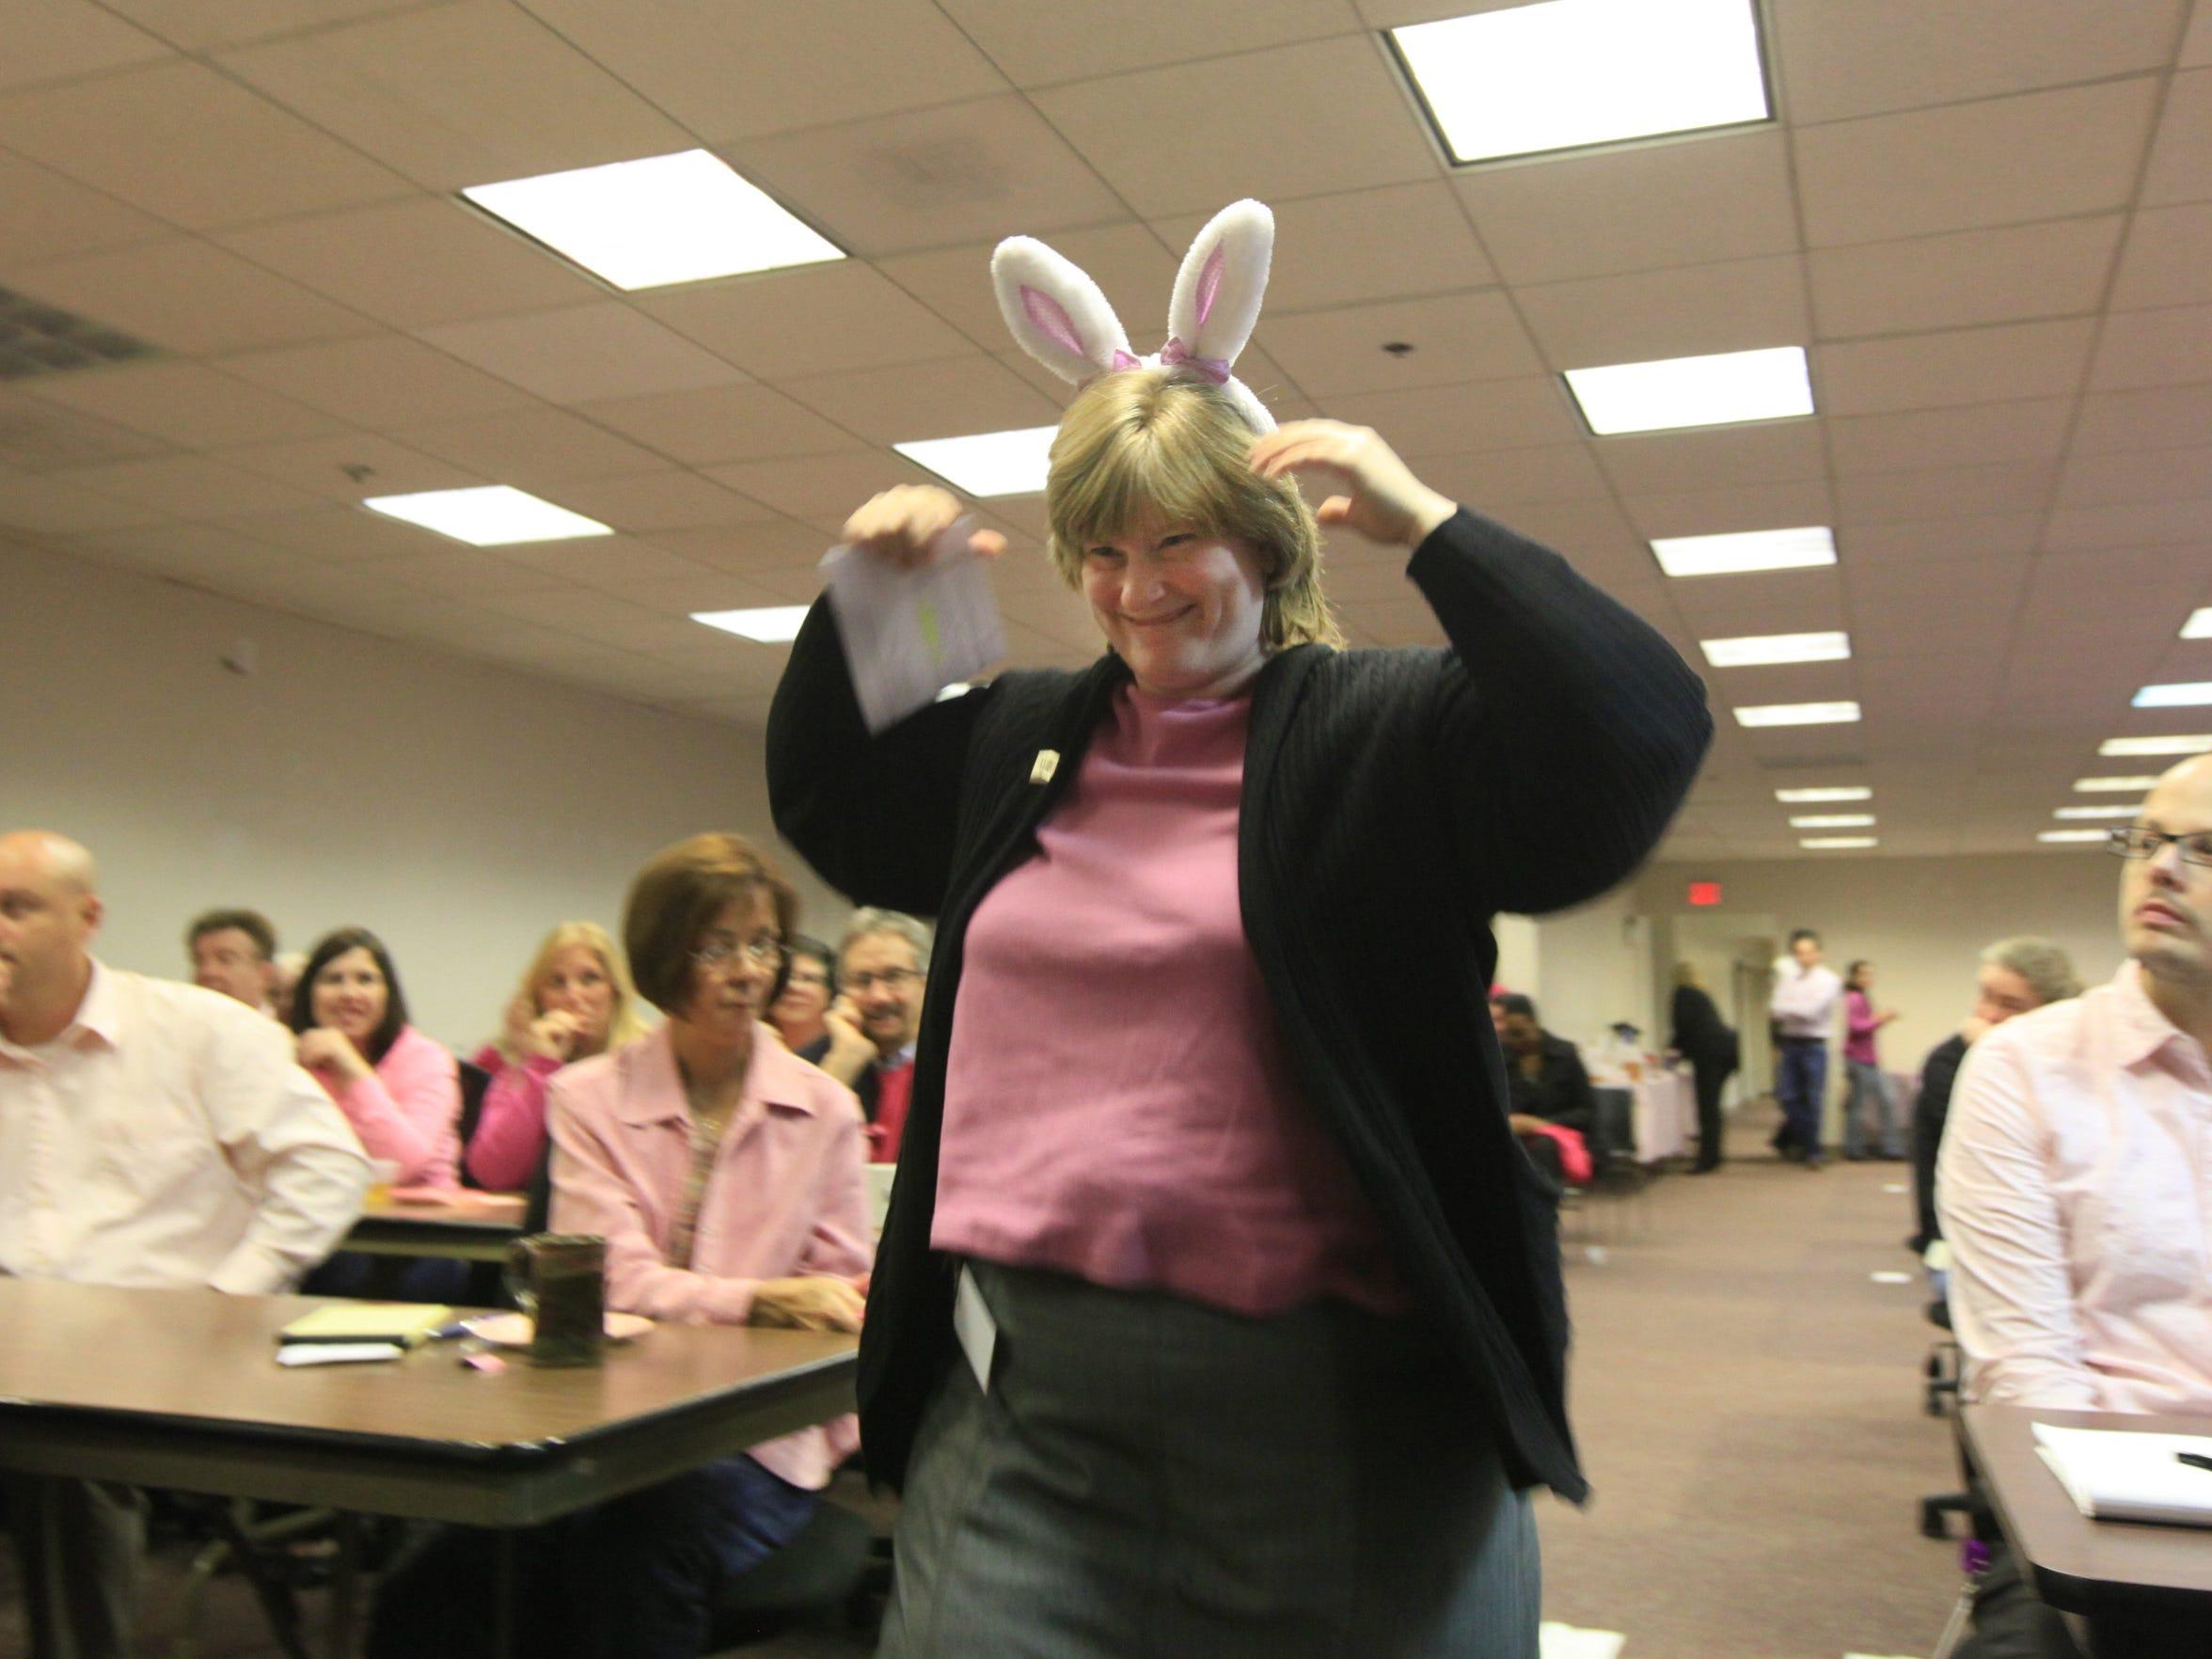 Merri Bayard, relocation accountant,  prepares to speak